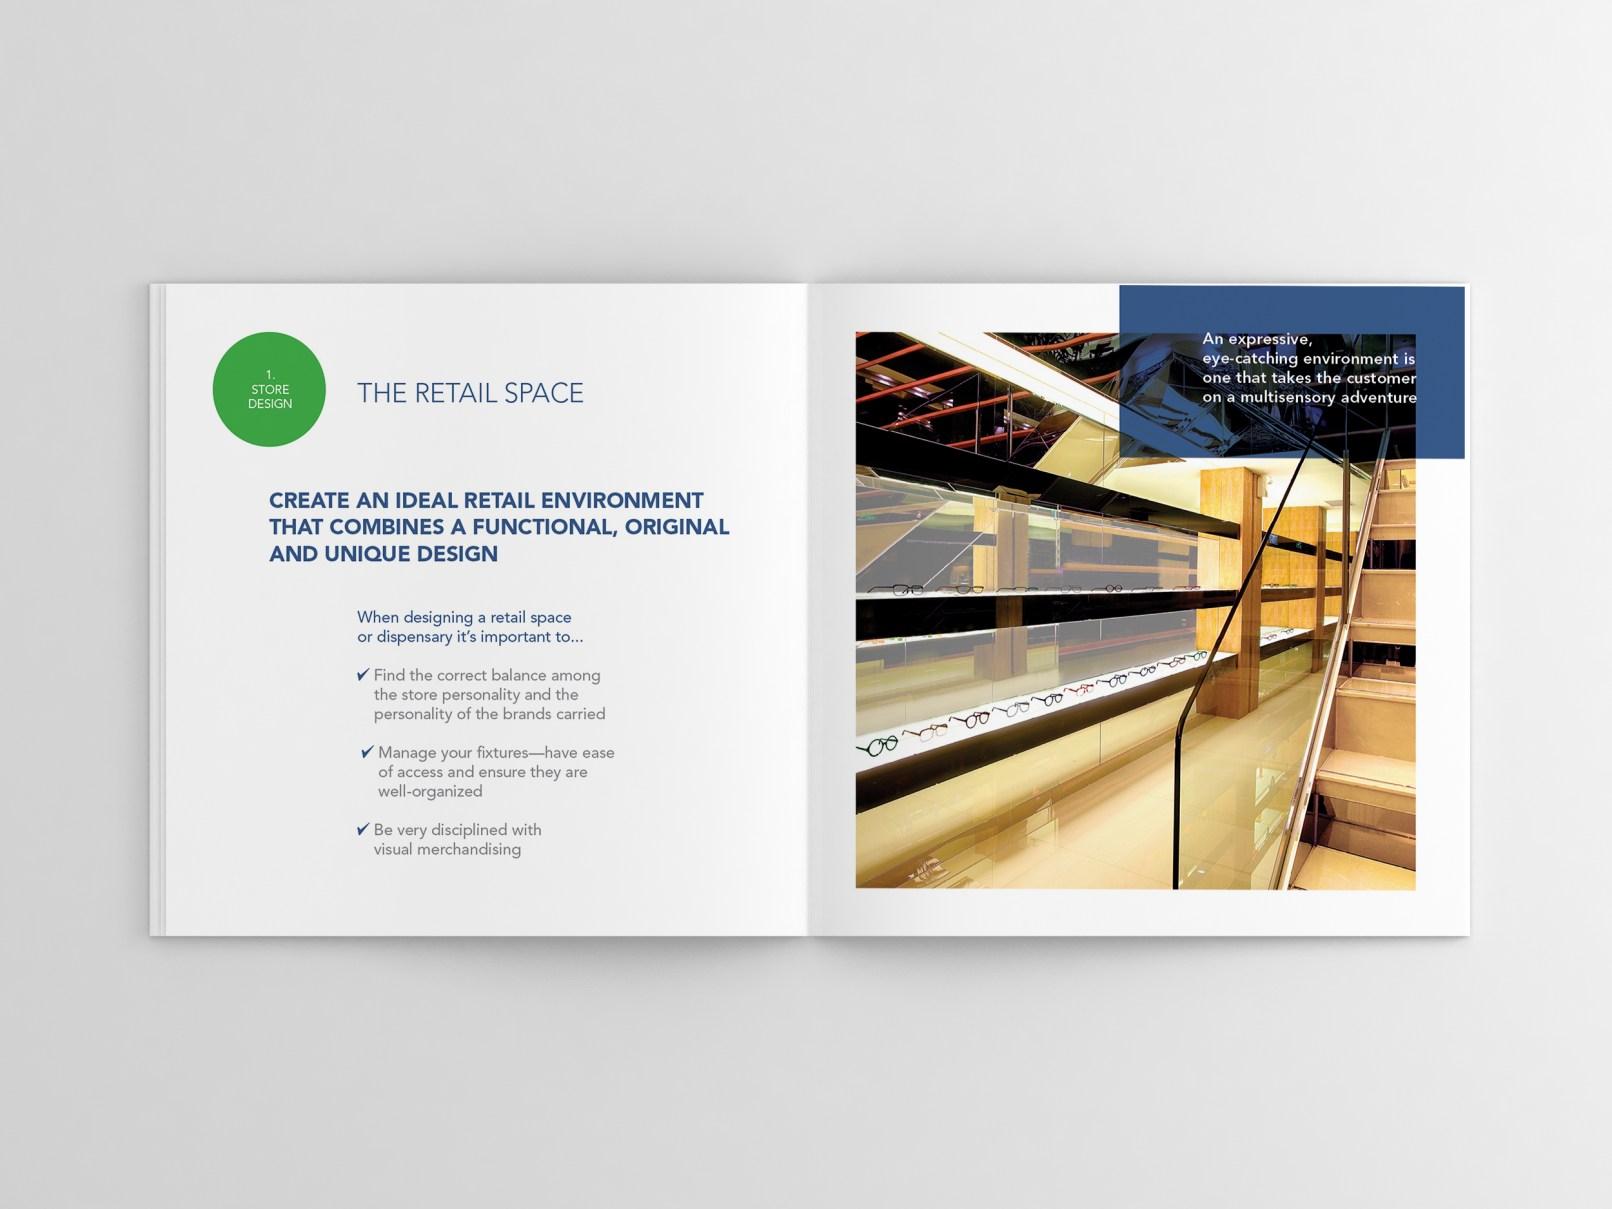 Luxottica - The Art of Retailing Book